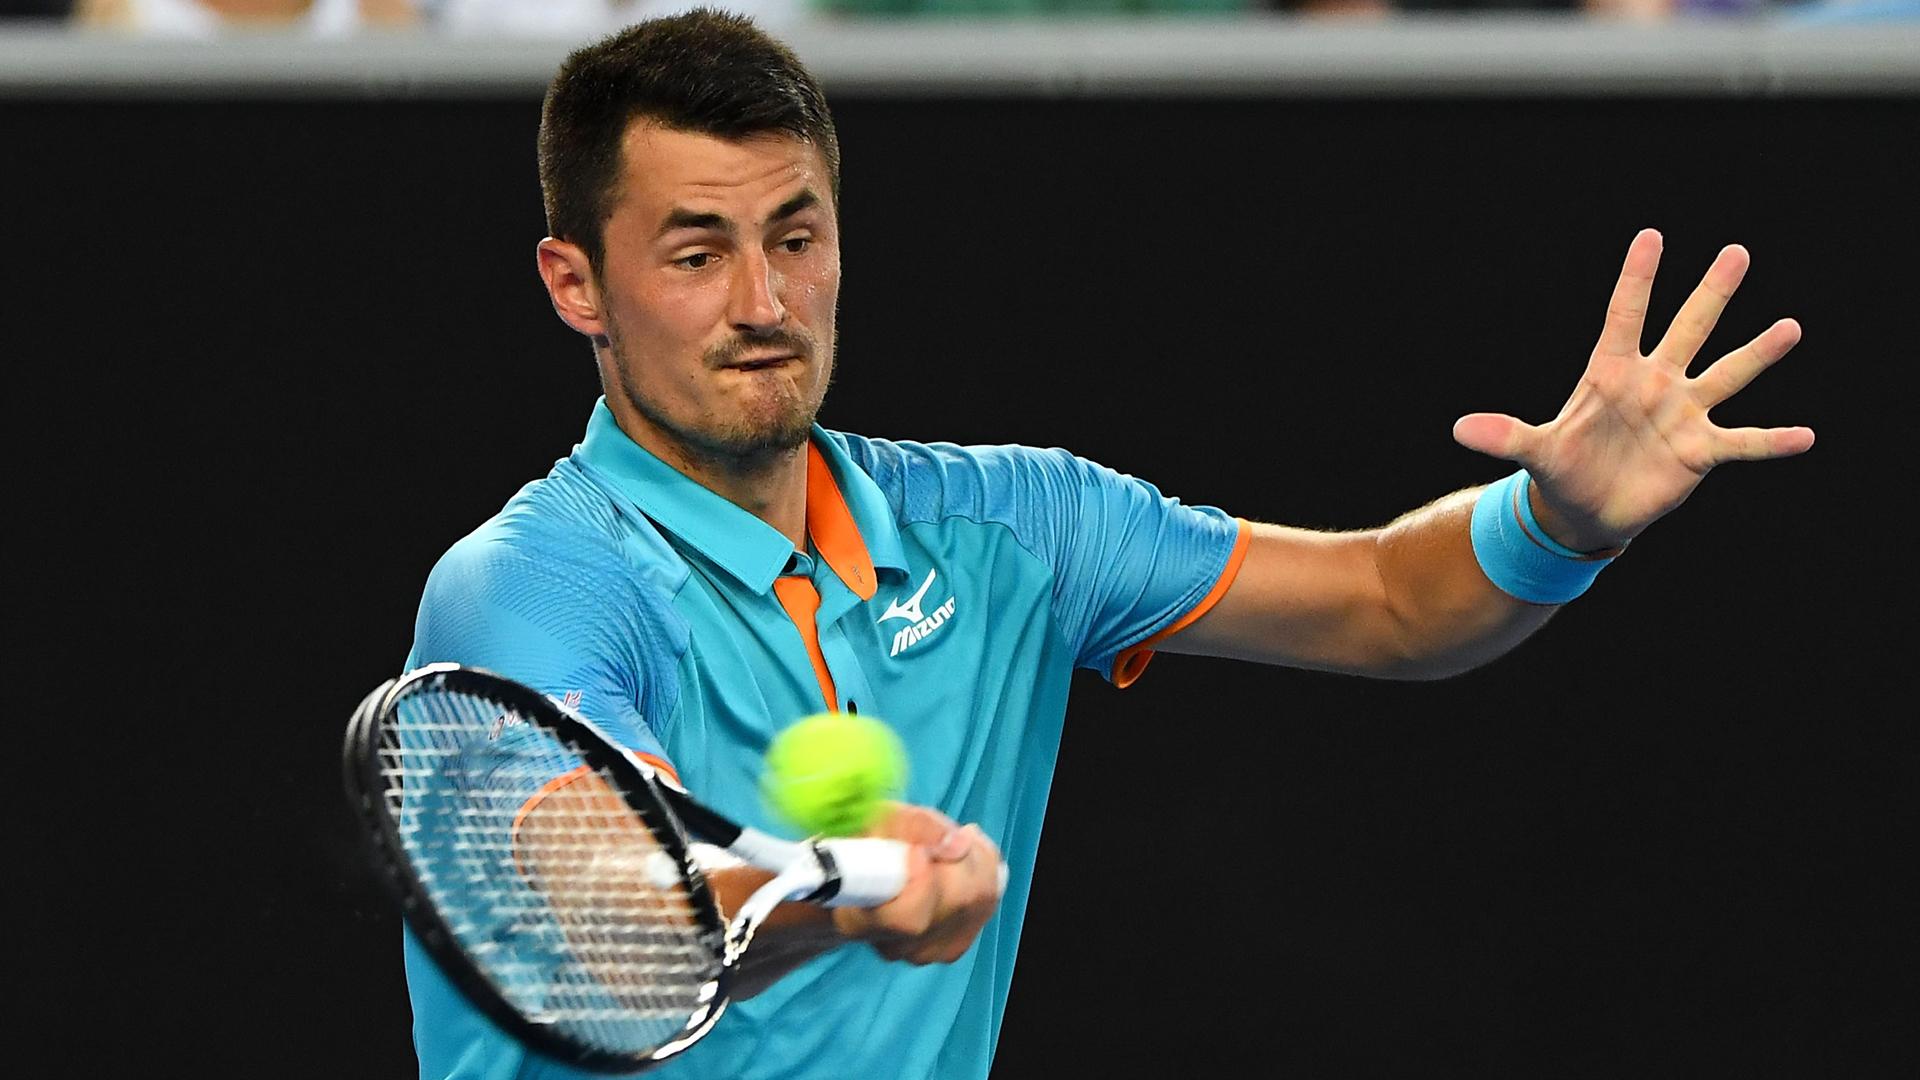 New York Open: Bernard Tomic sets up second-round clash against John Isner